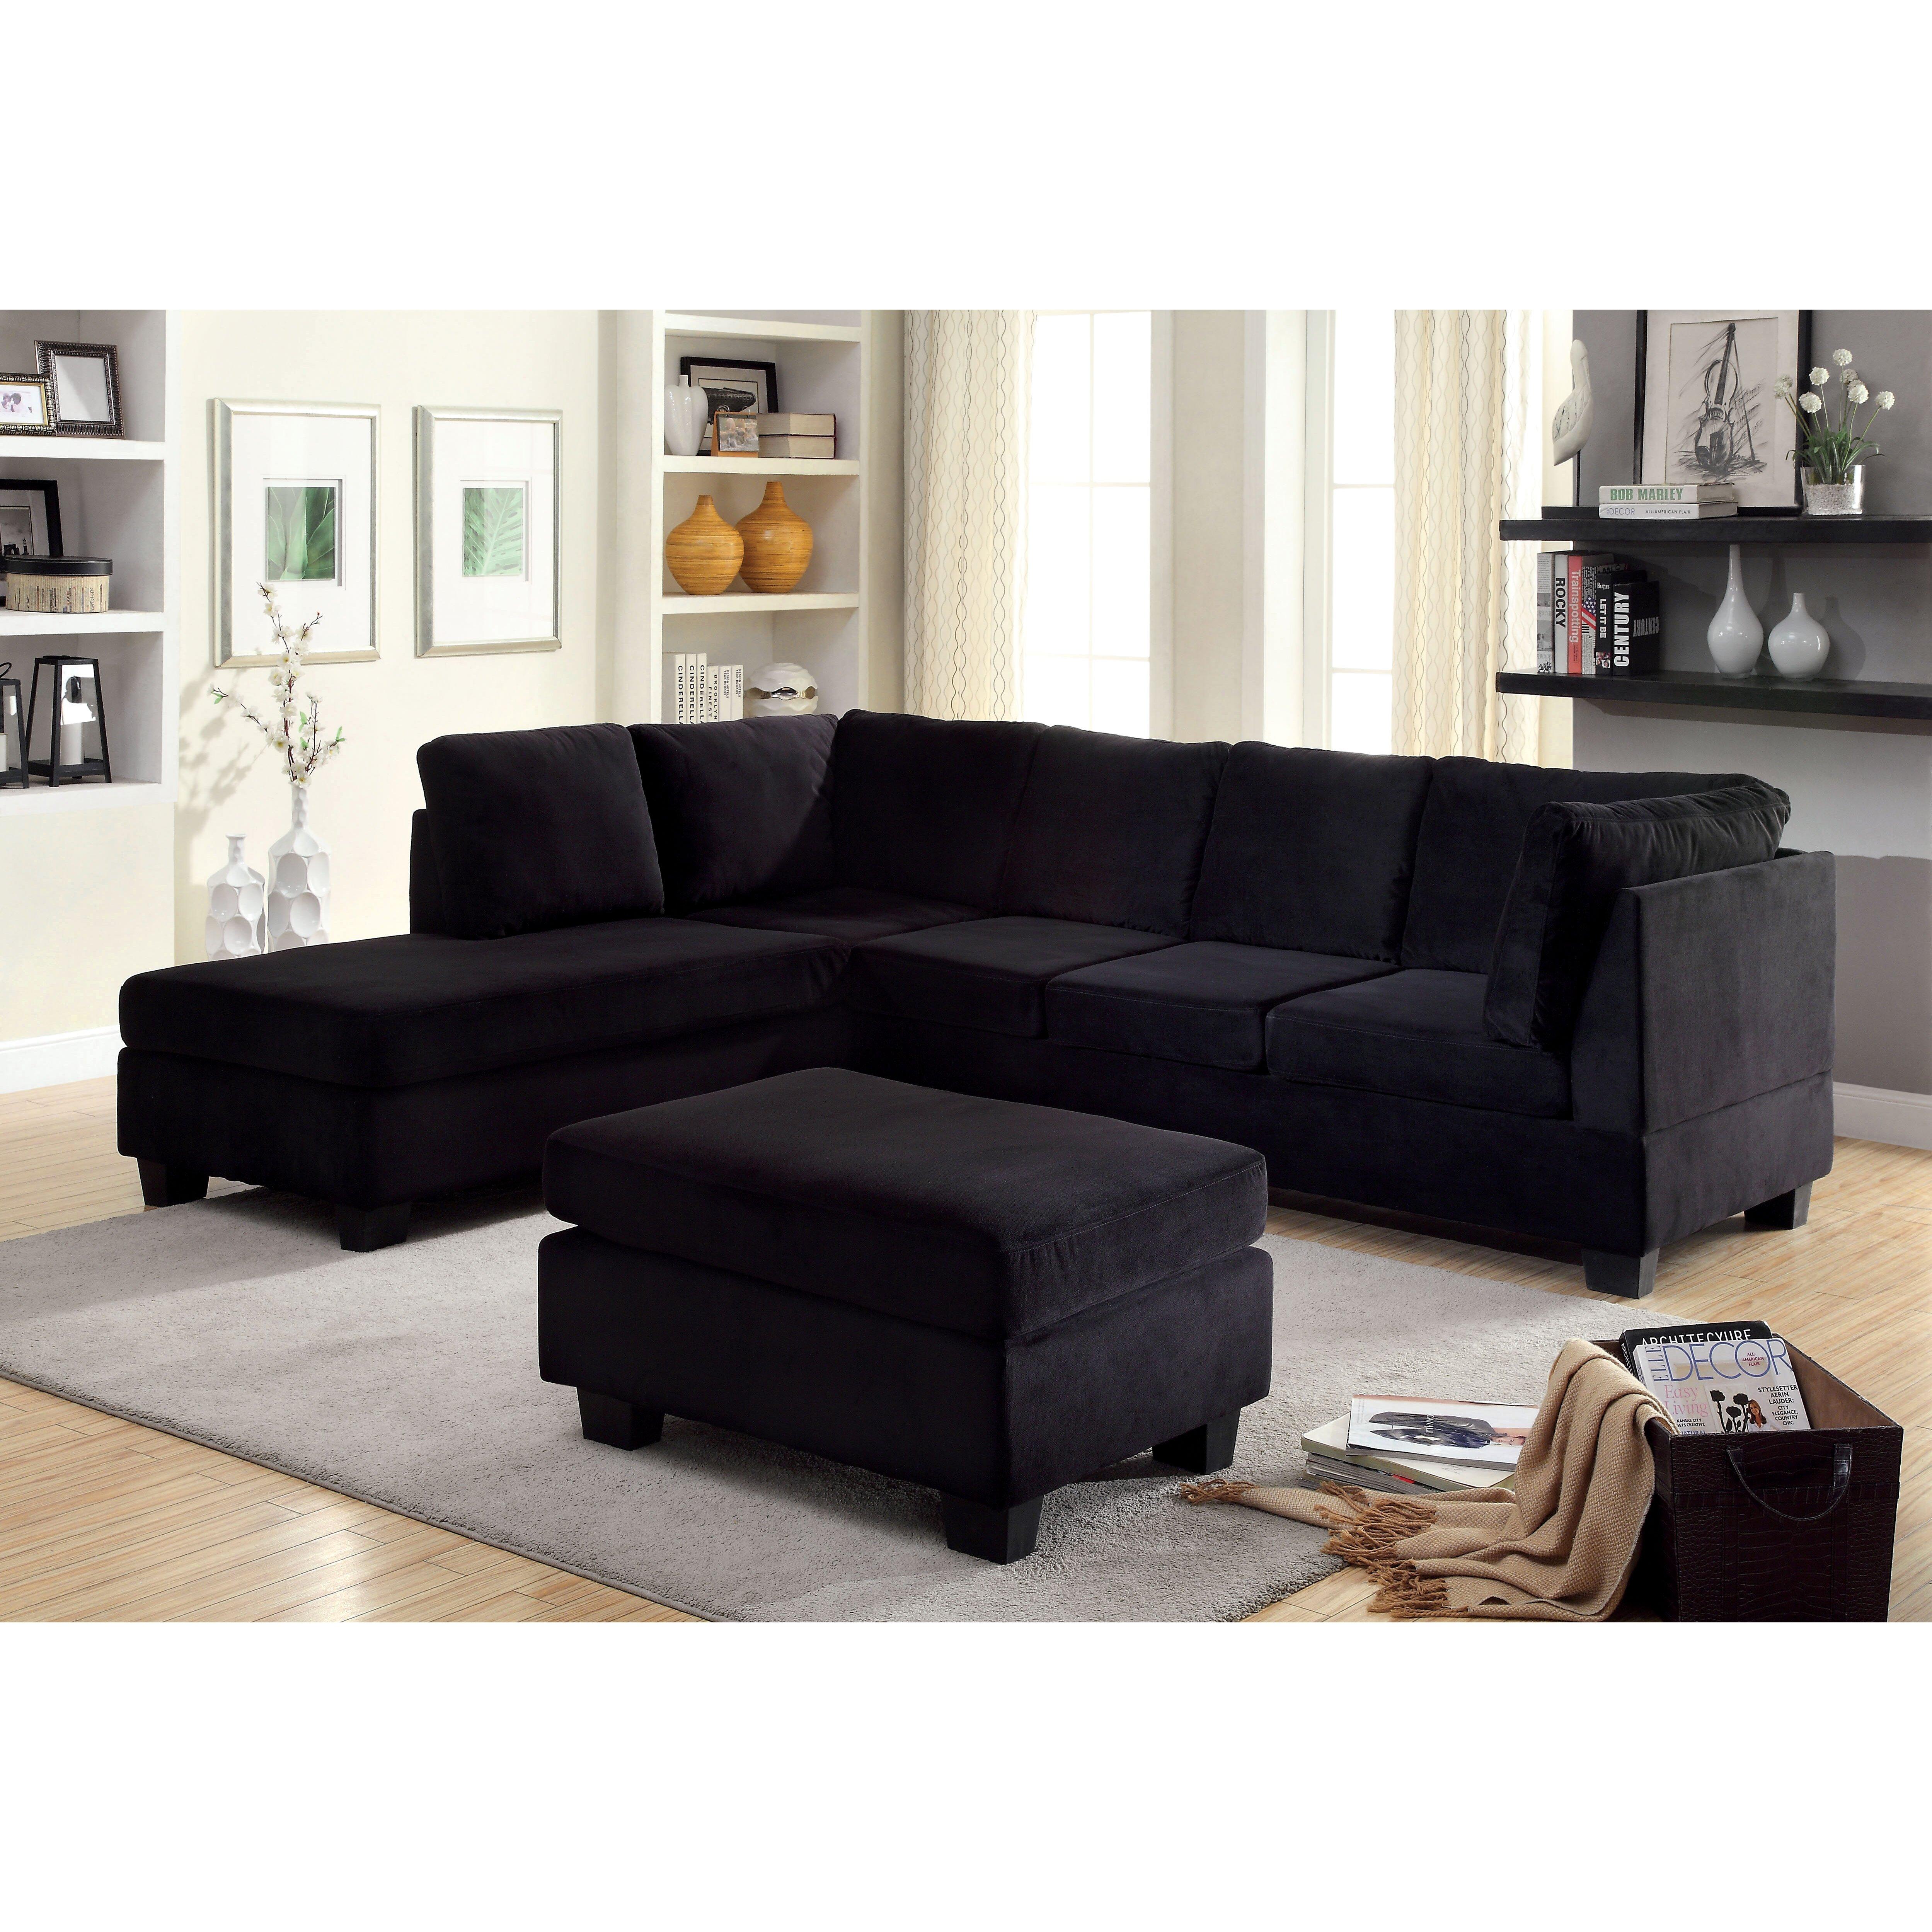 Hokku designs narissa sectional for Hokku designs living room furniture